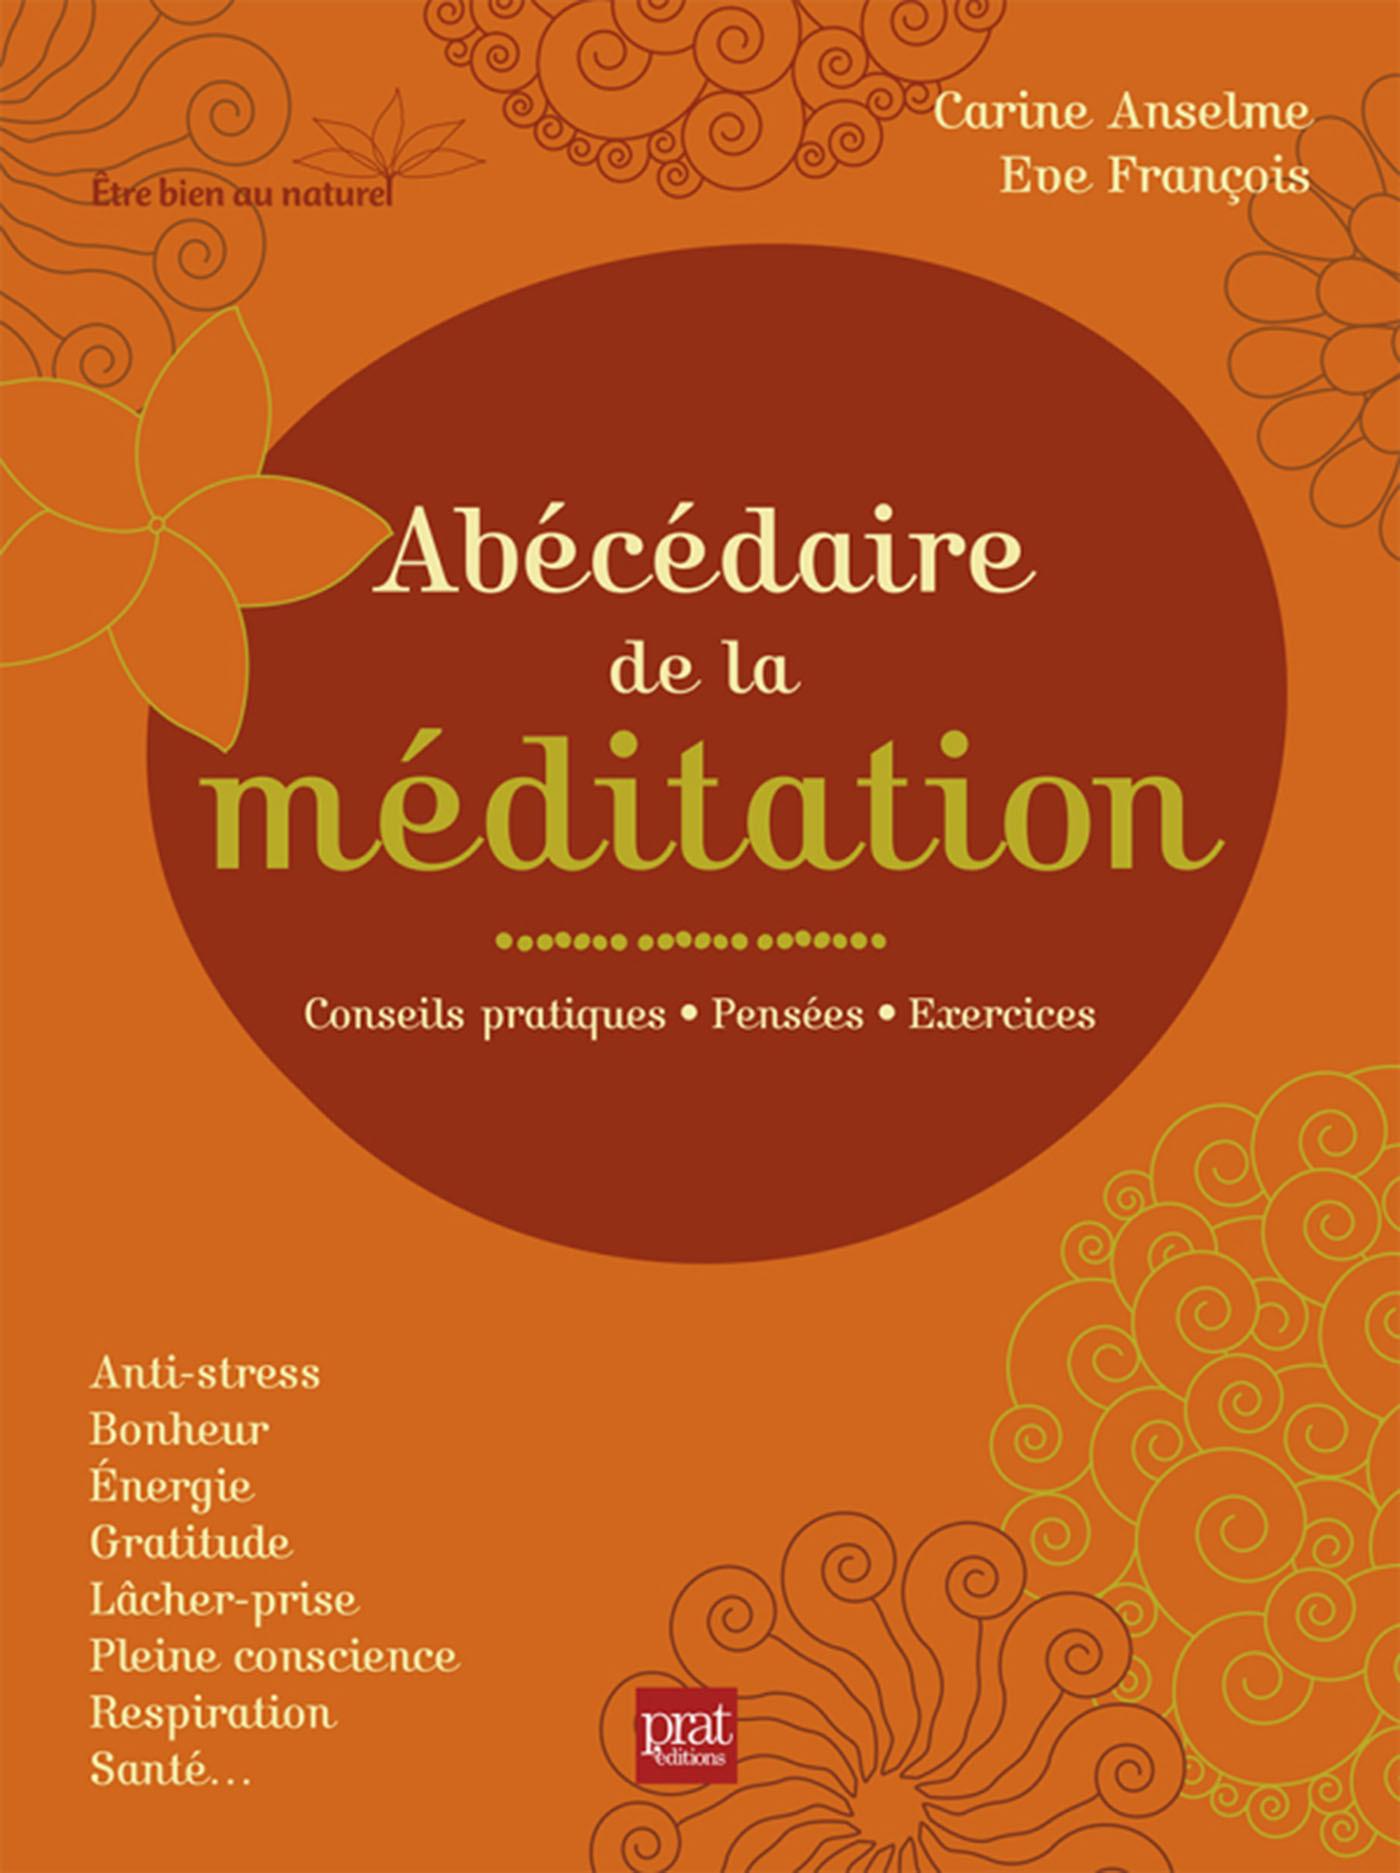 ABECEDAIRE DE LA MEDITATION